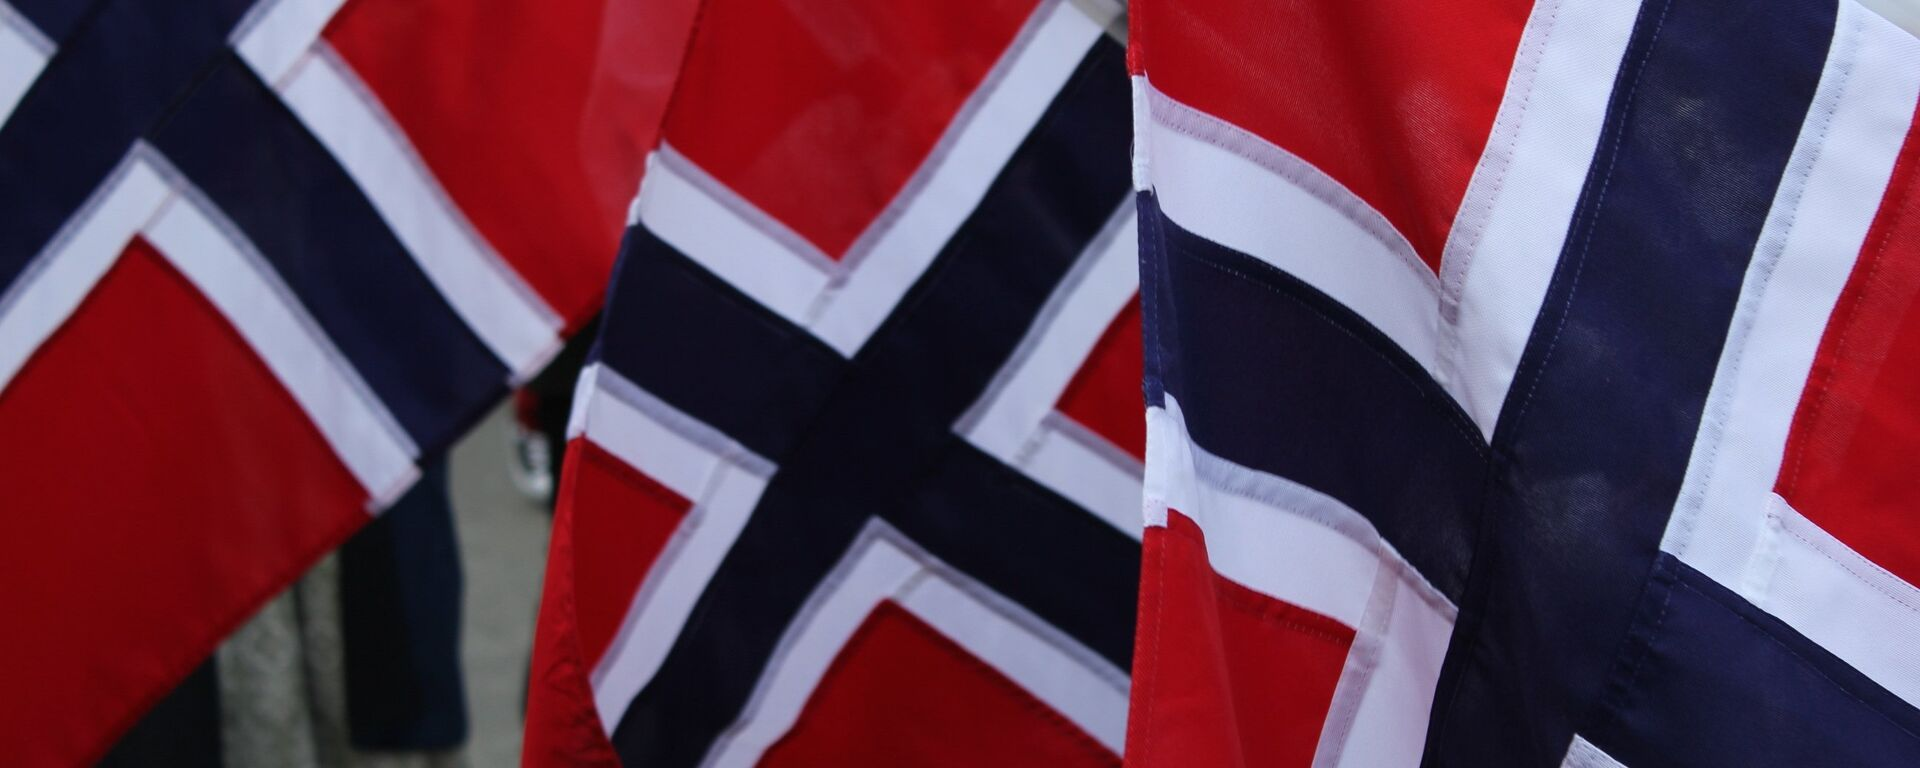 Bandera de Noruega - Sputnik Mundo, 1920, 26.09.2021